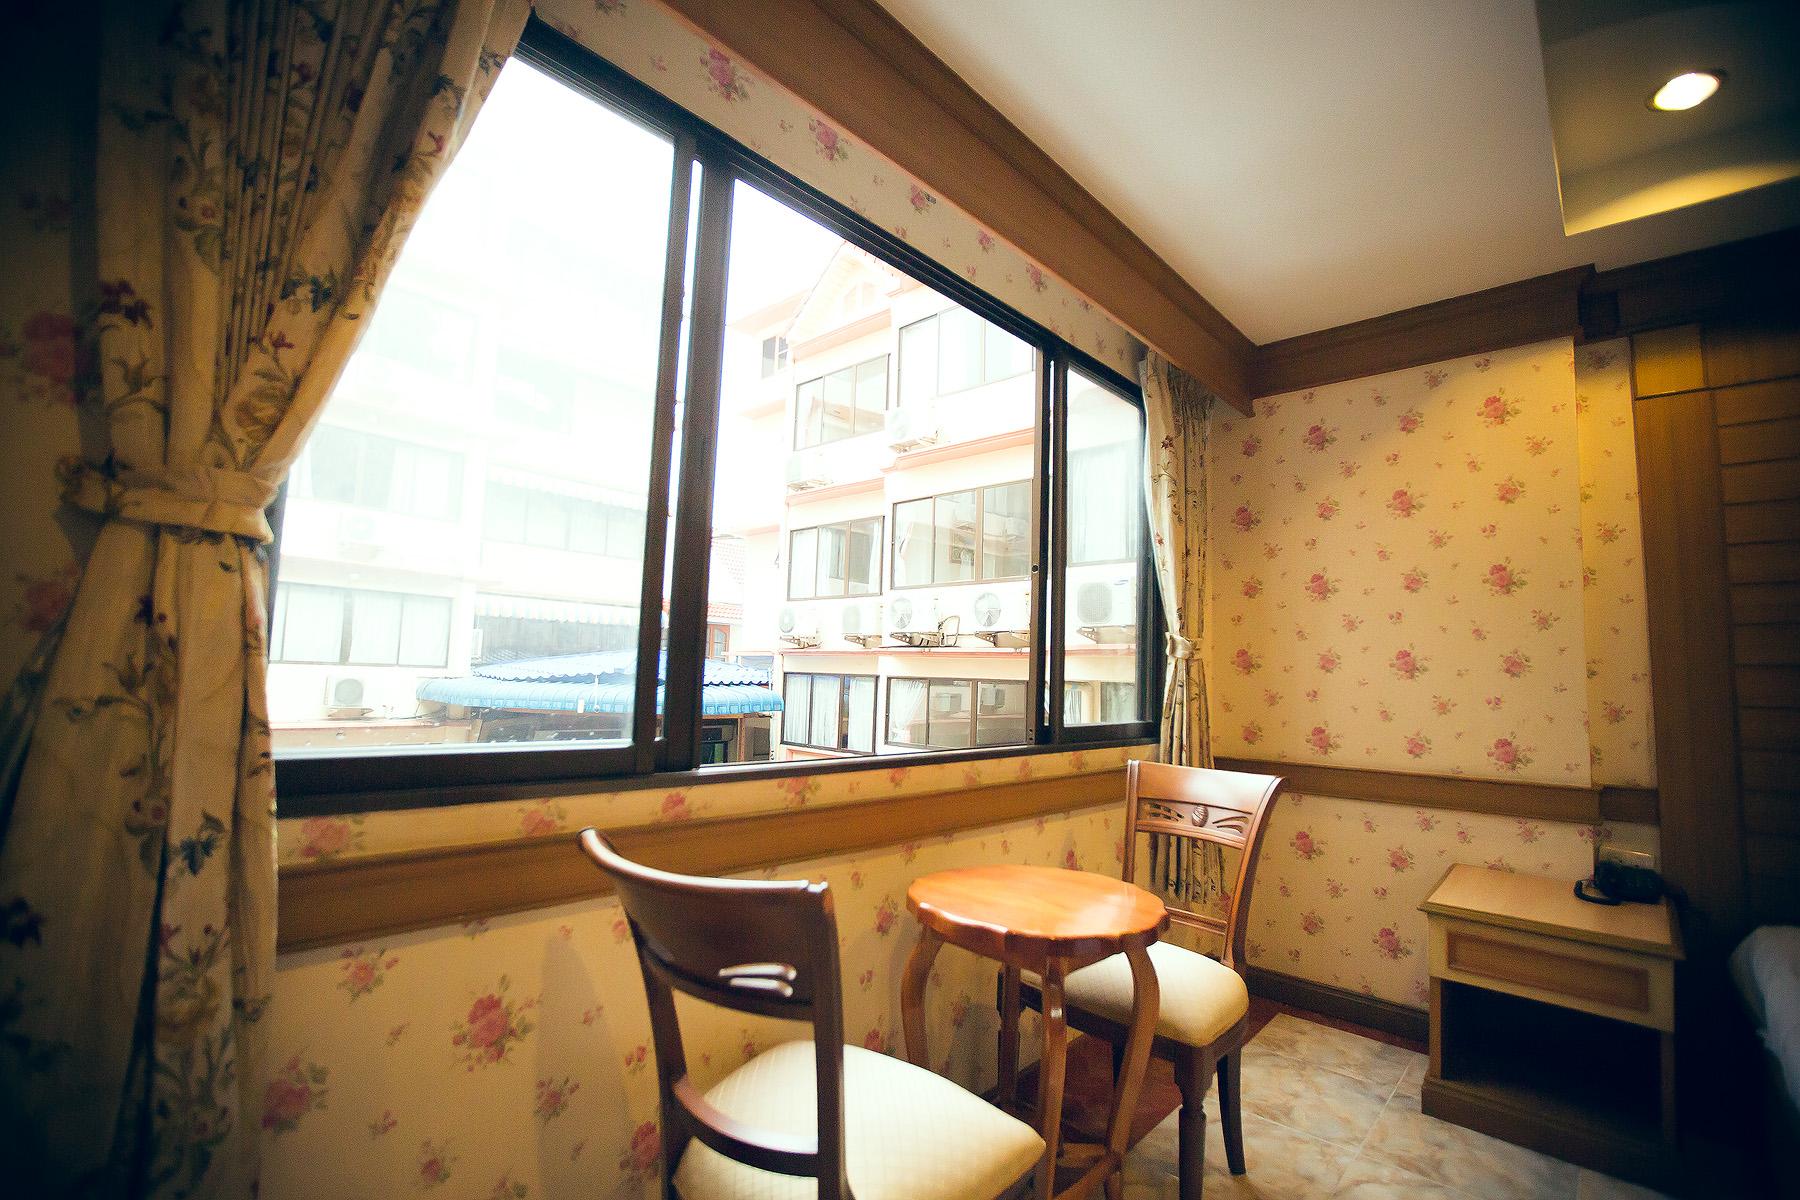 Dream Hotel Pattaay Deluxe room